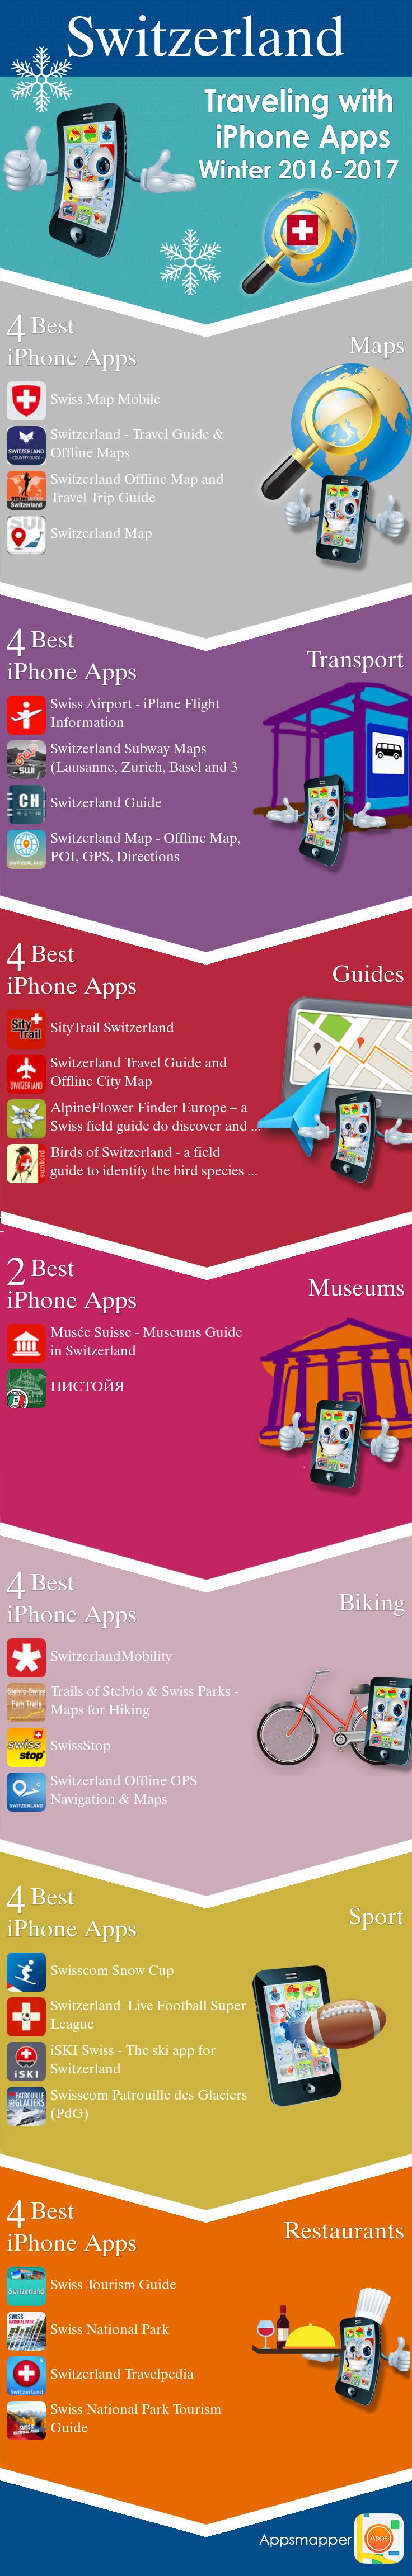 Switzerland iPhonе Apps App, Travel app, Iphone apps